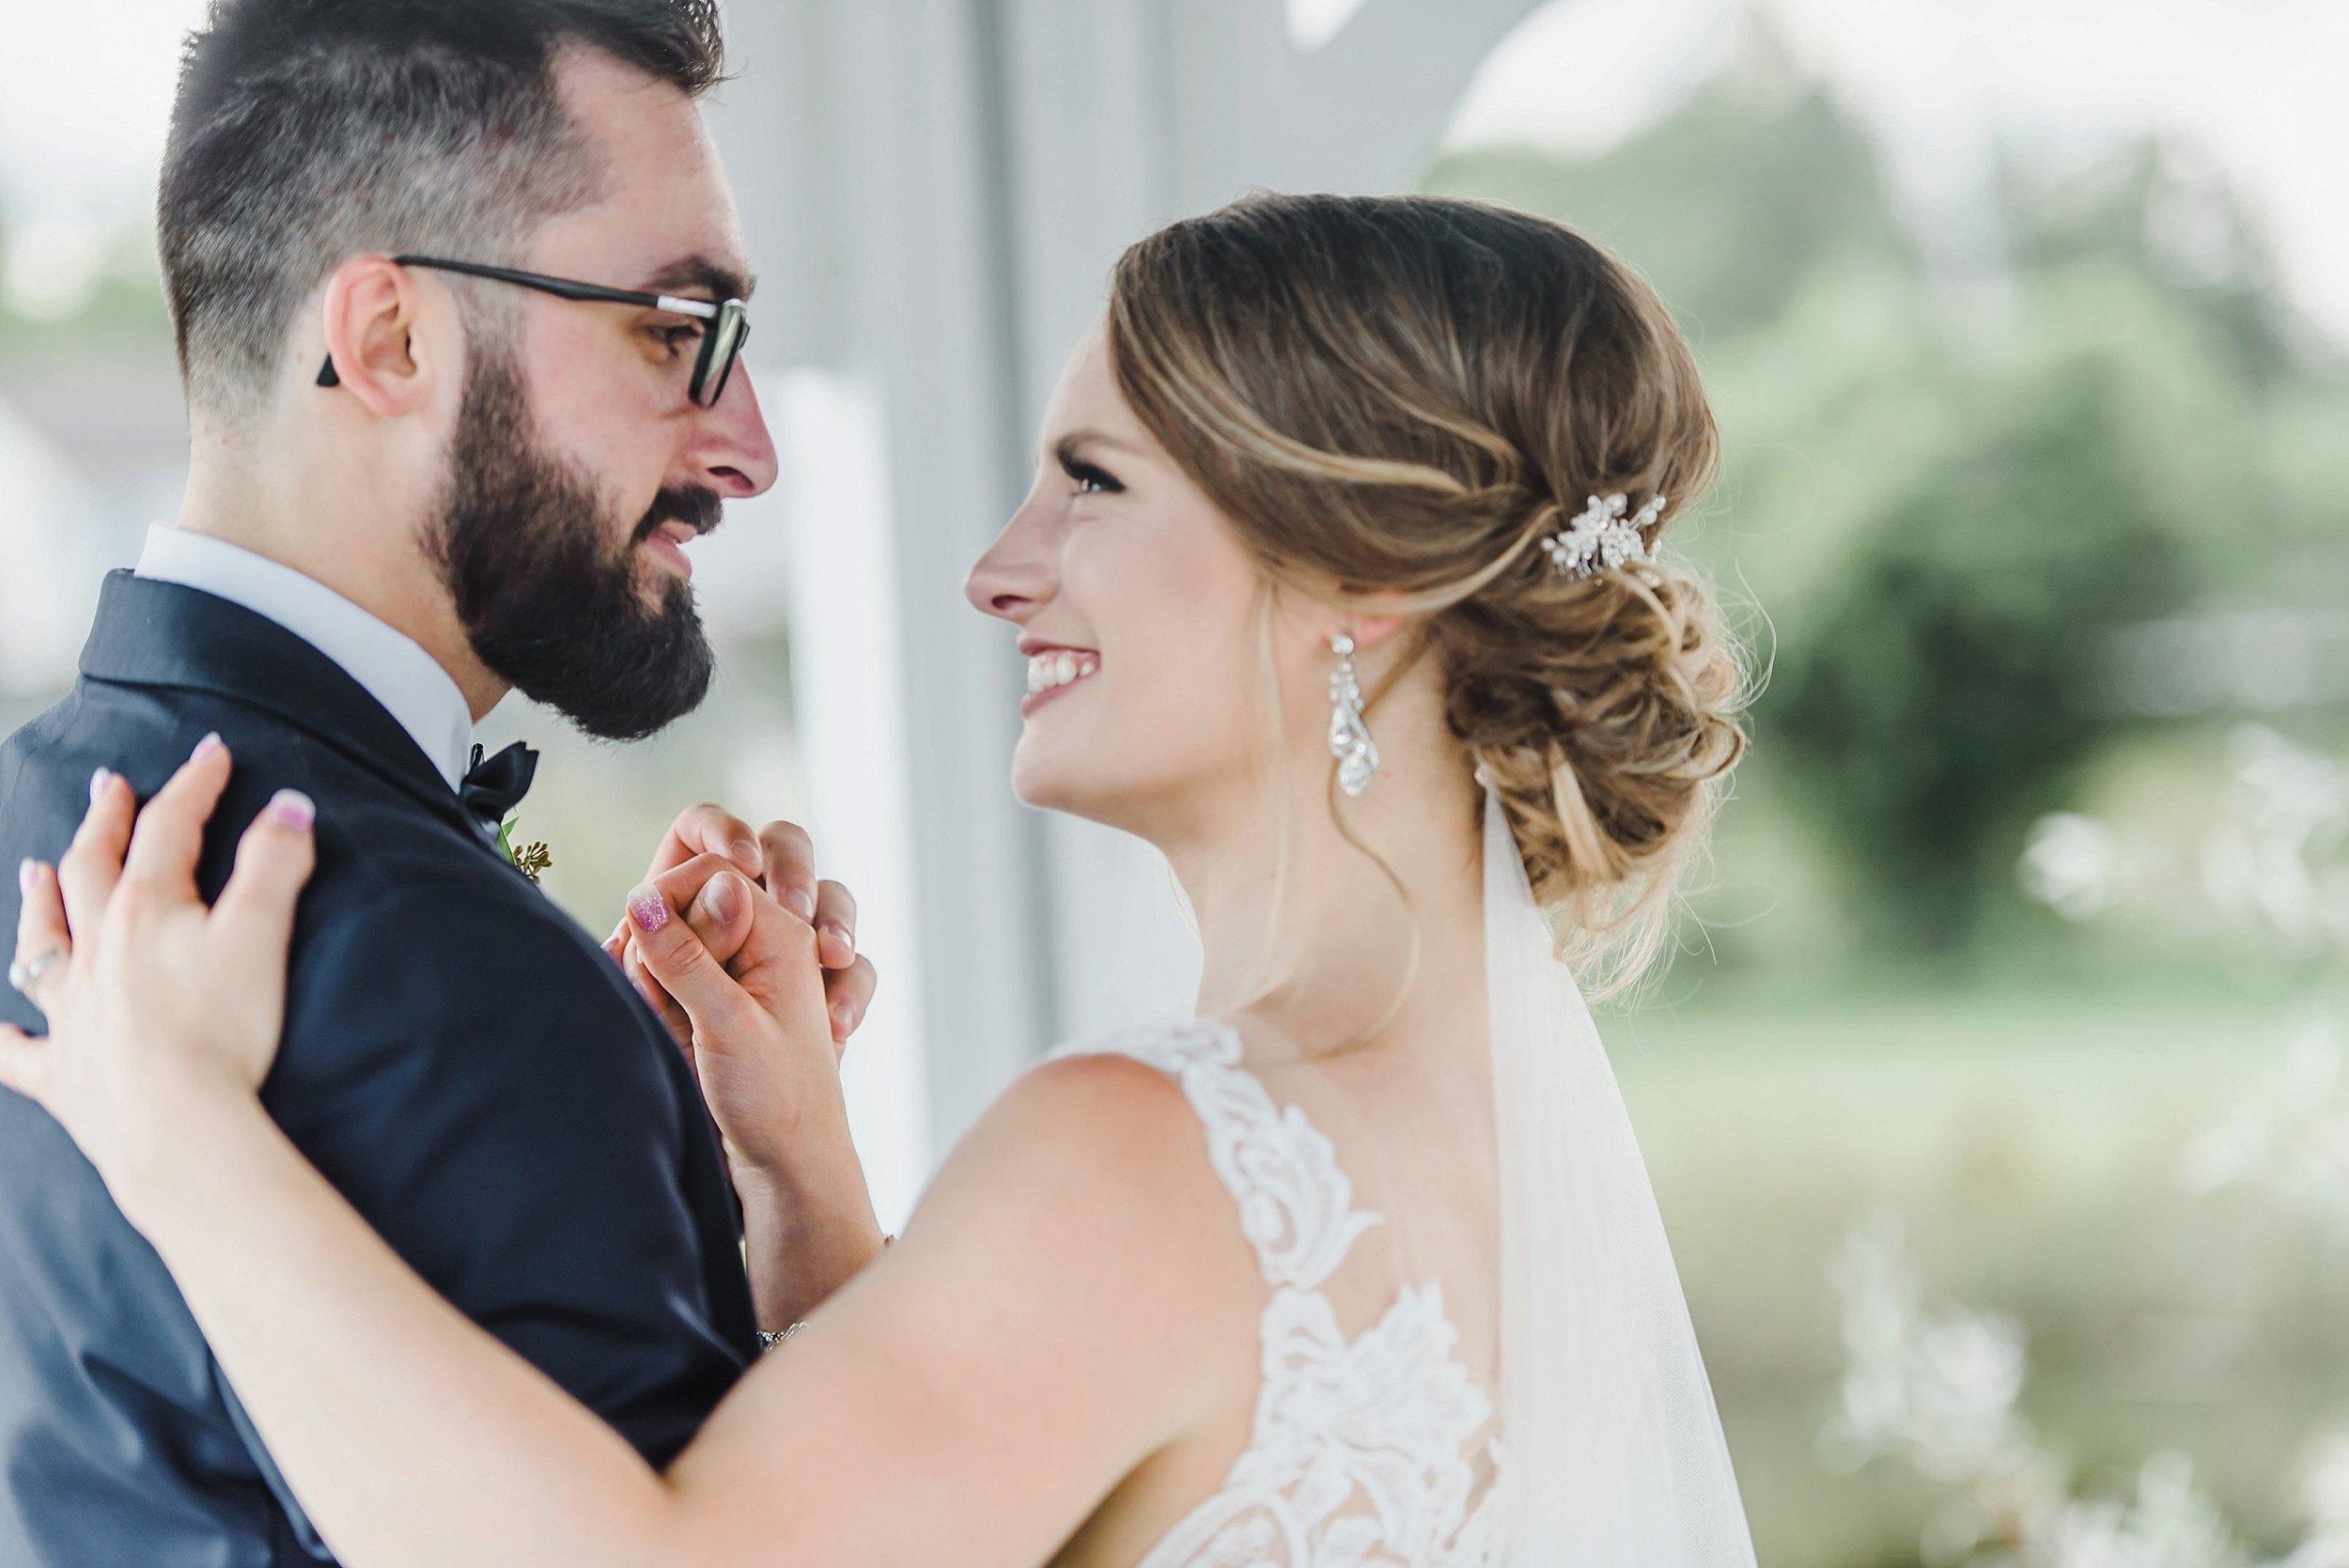 light airy indie fine art ottawa wedding photographer | Ali and Batoul Photography_1293.jpg